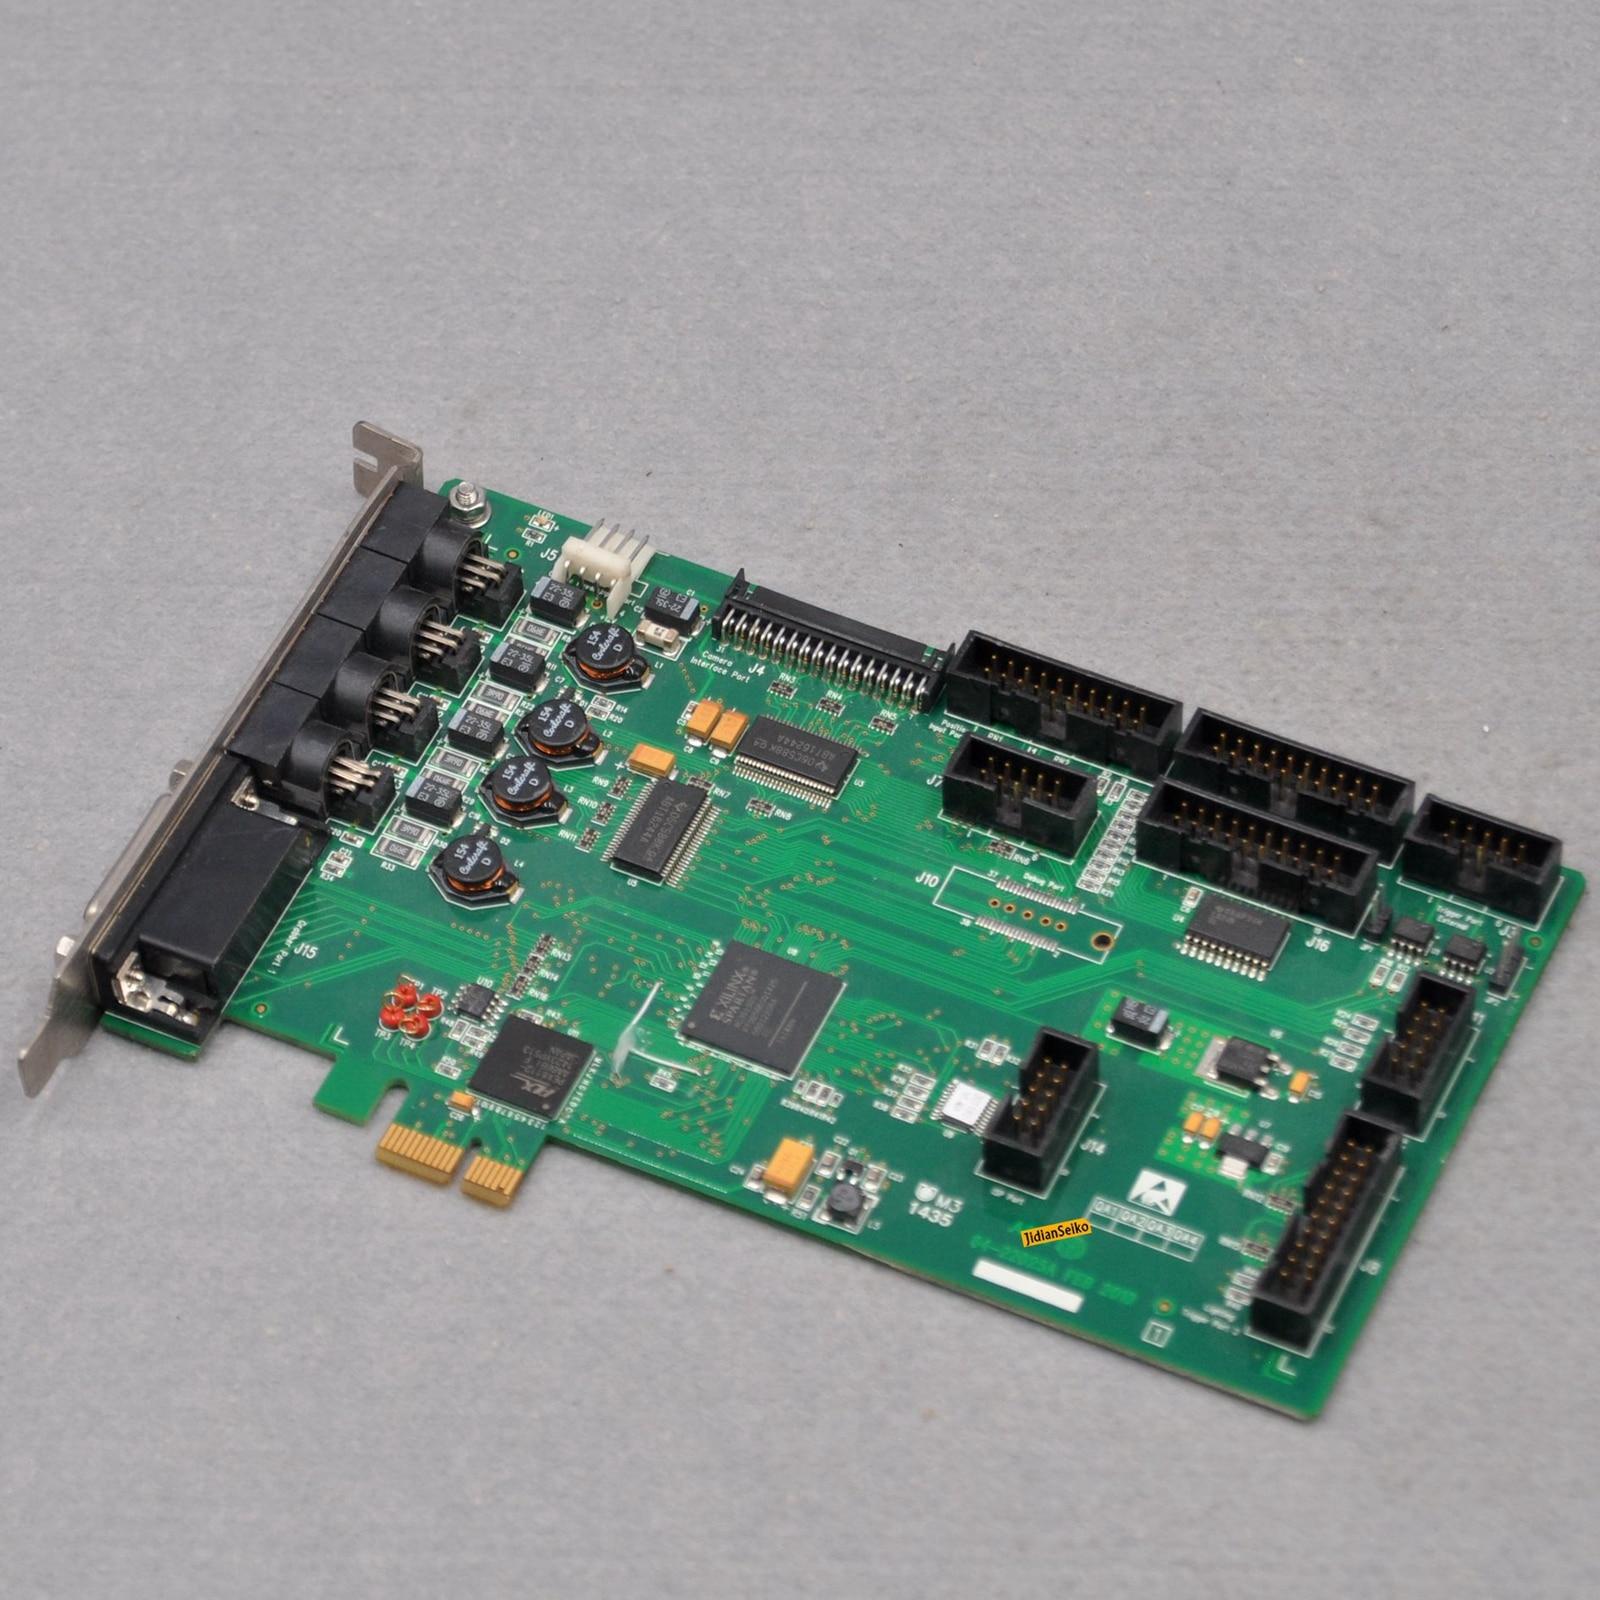 64-22025A FEB 2010 Industrial Capture Card PCI Card